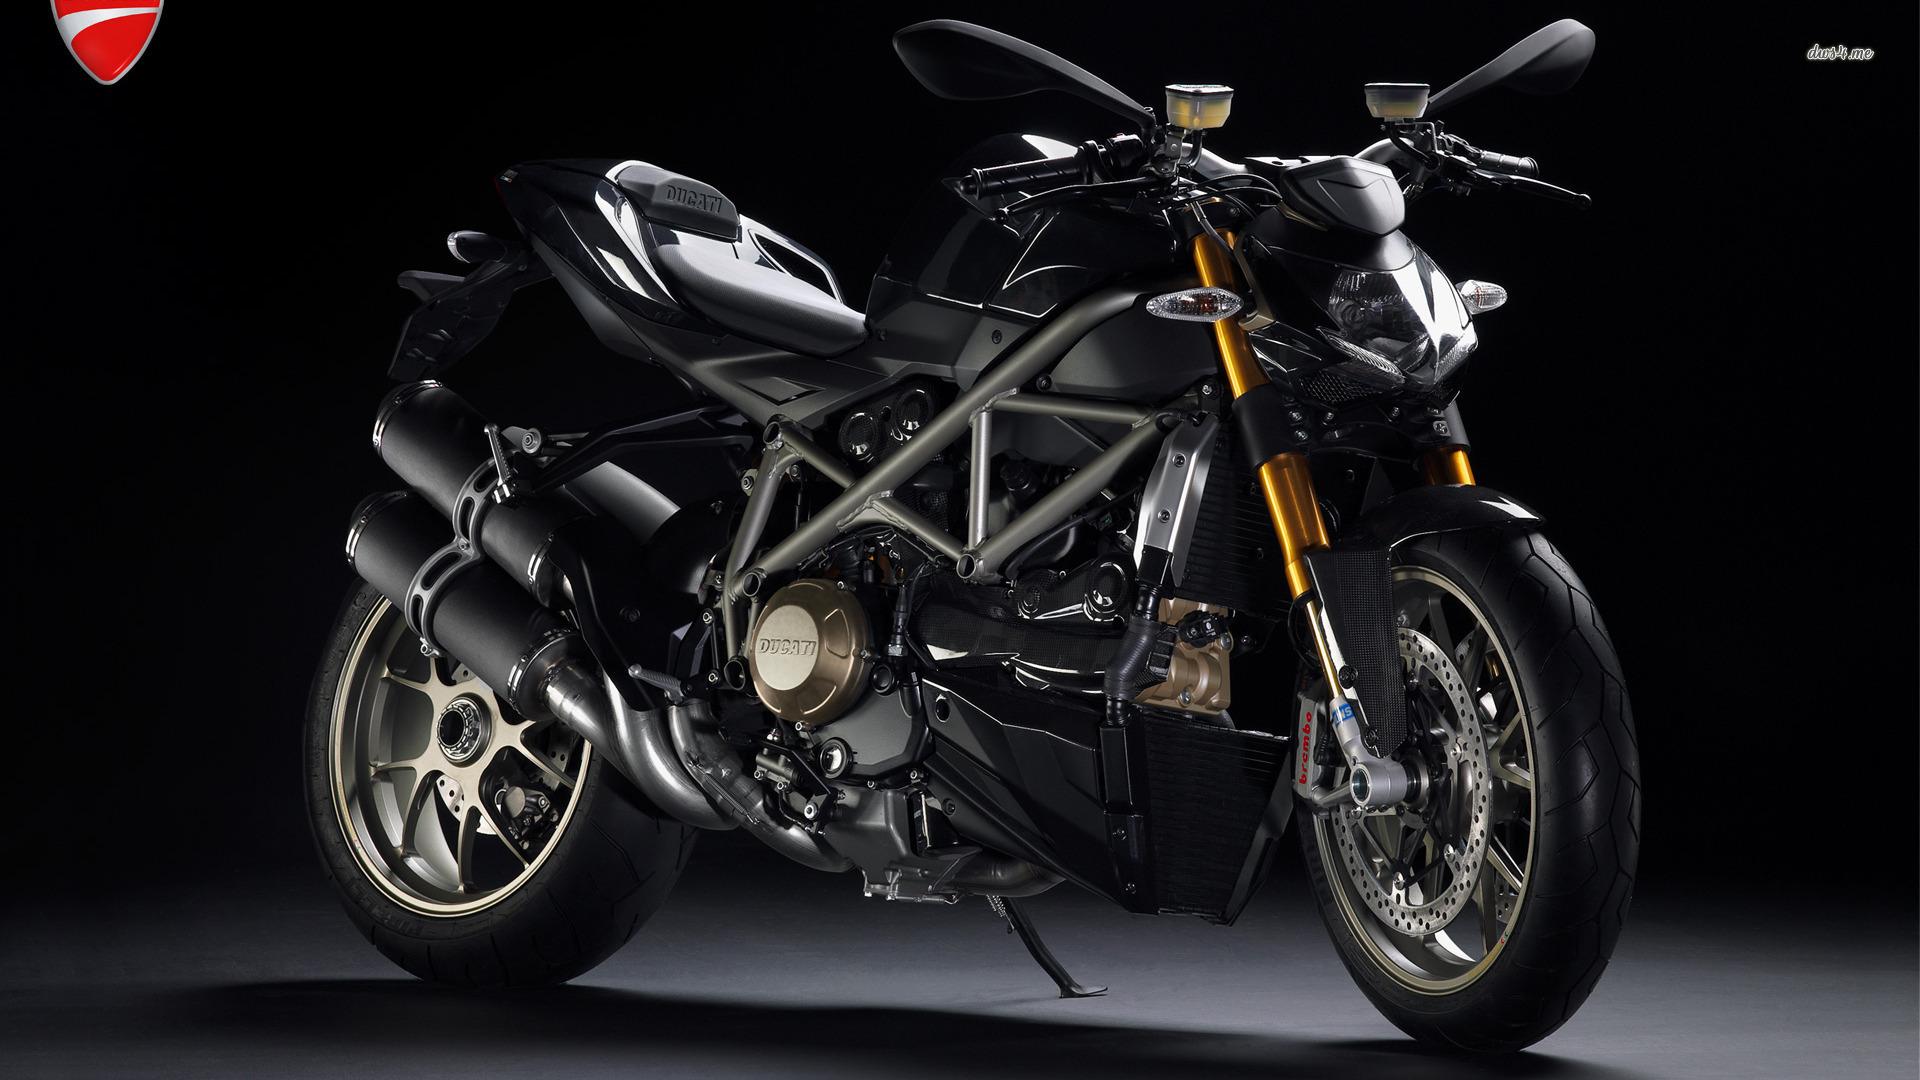 Beautiful Bike Ducati Streetfighter 848 Desktop Wallpapers 1600x900